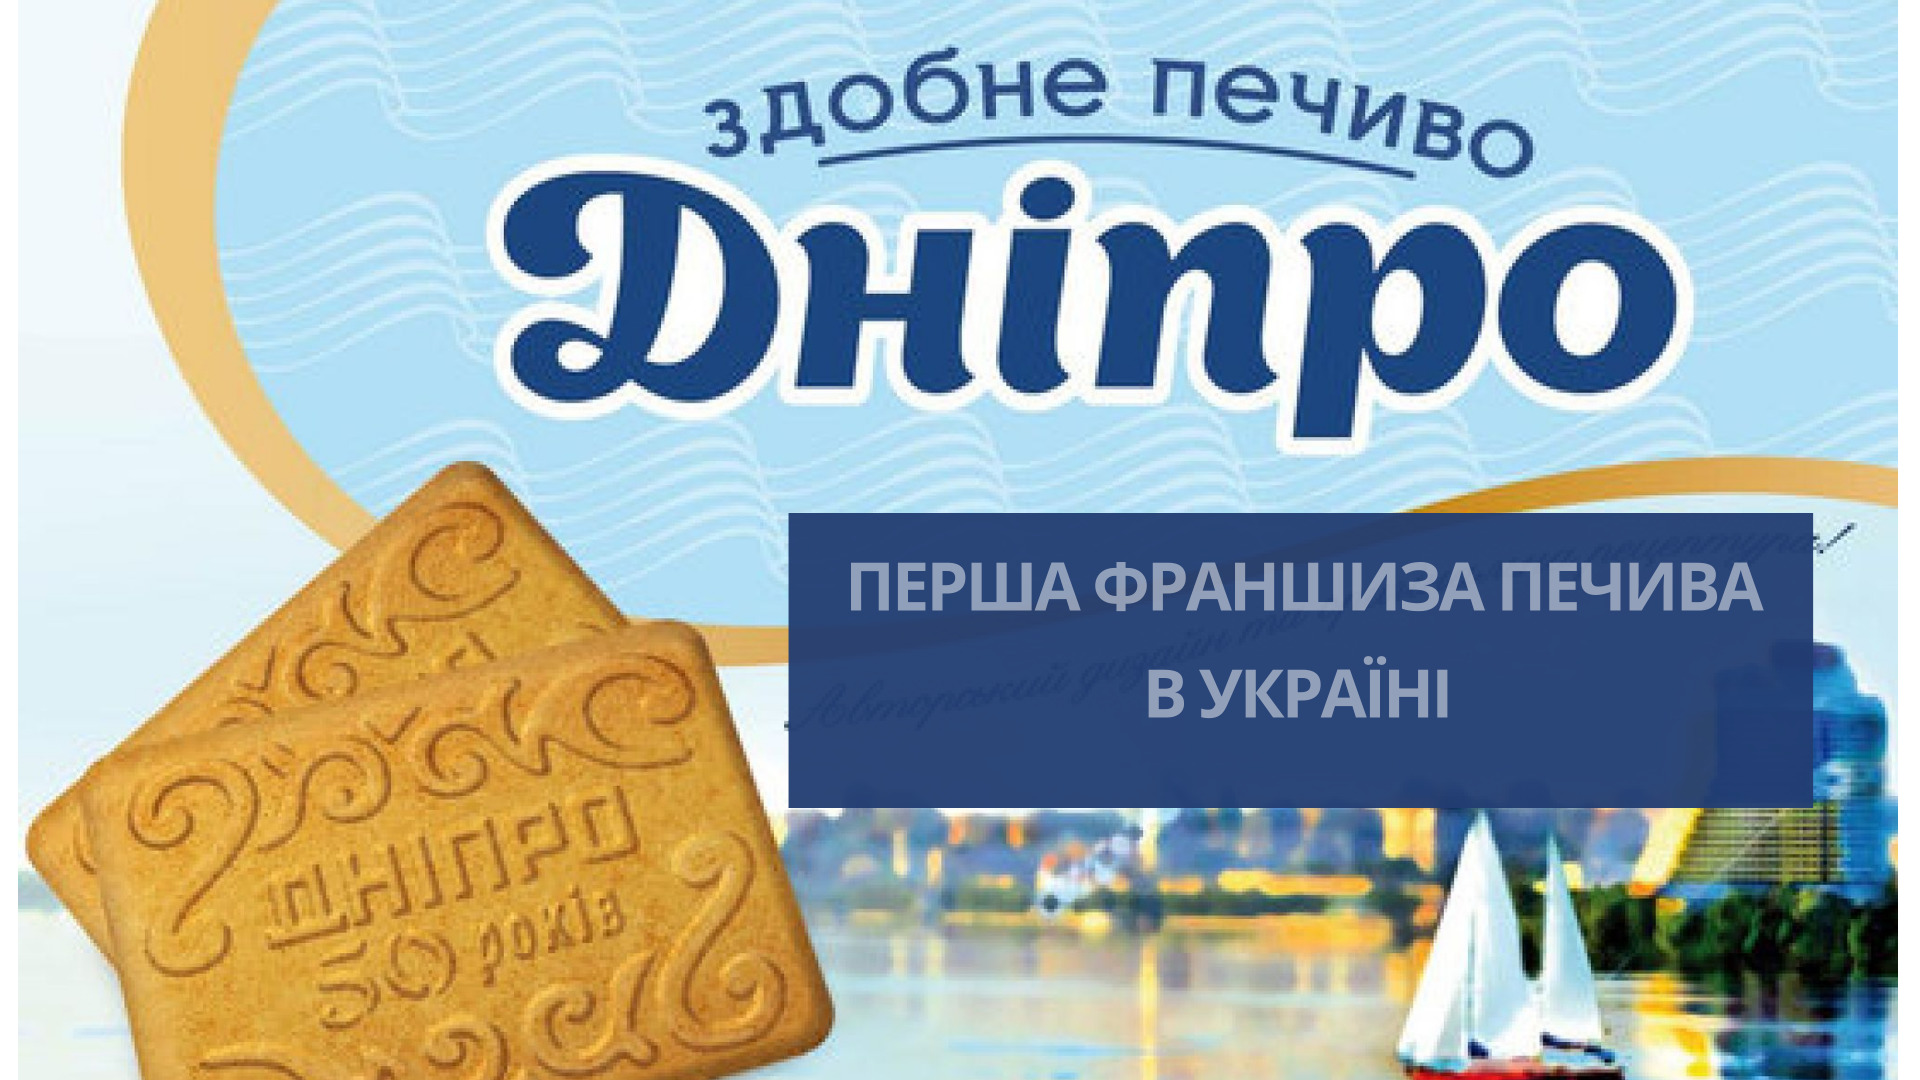 перша франшиза печива в Україні